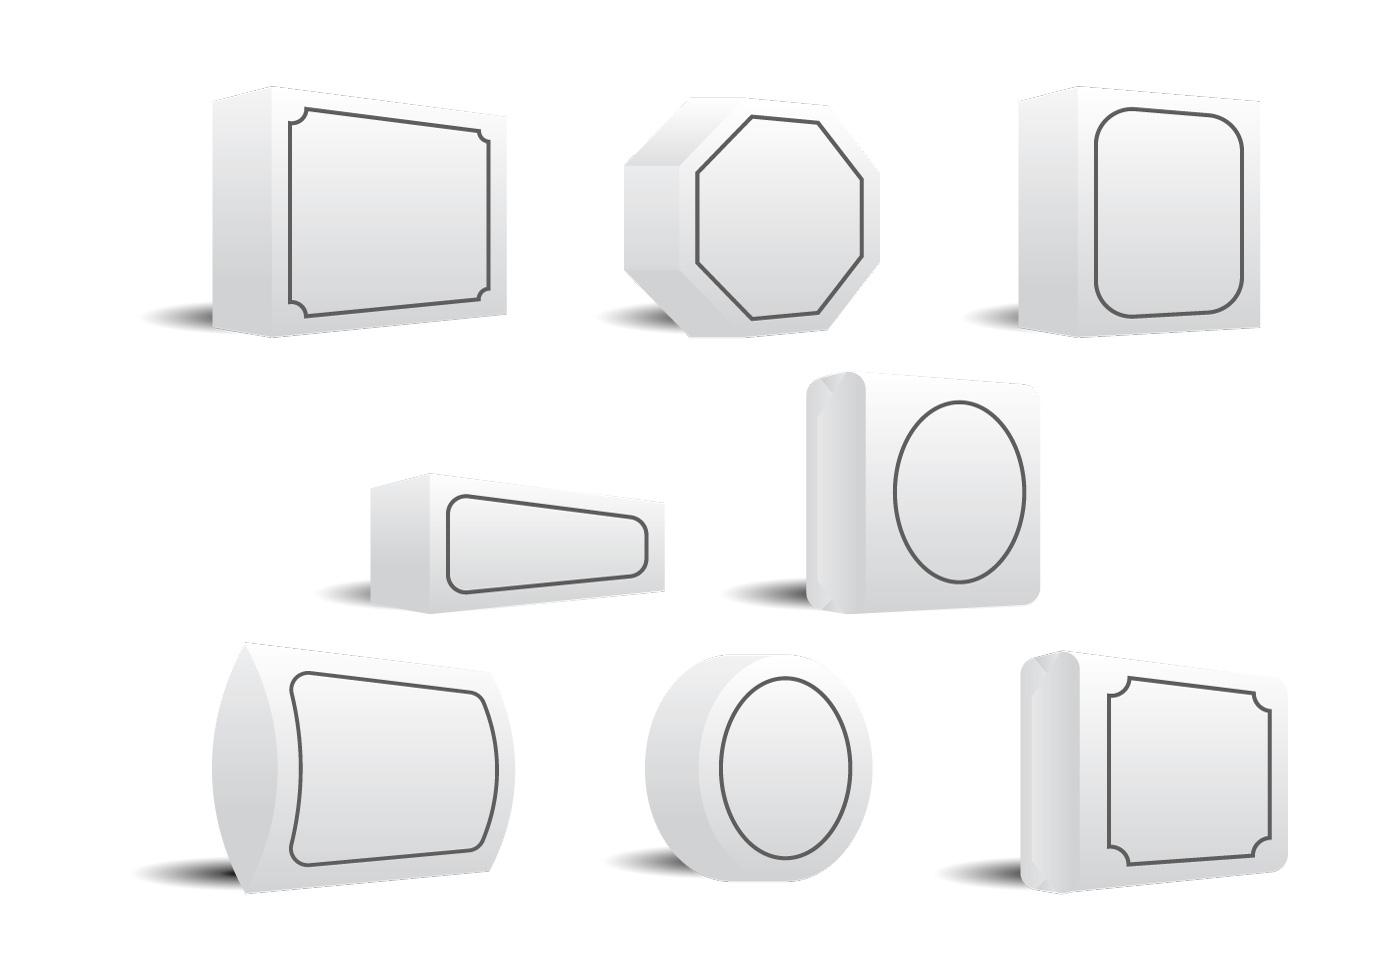 soap box design template - soap box collection download free vector art stock